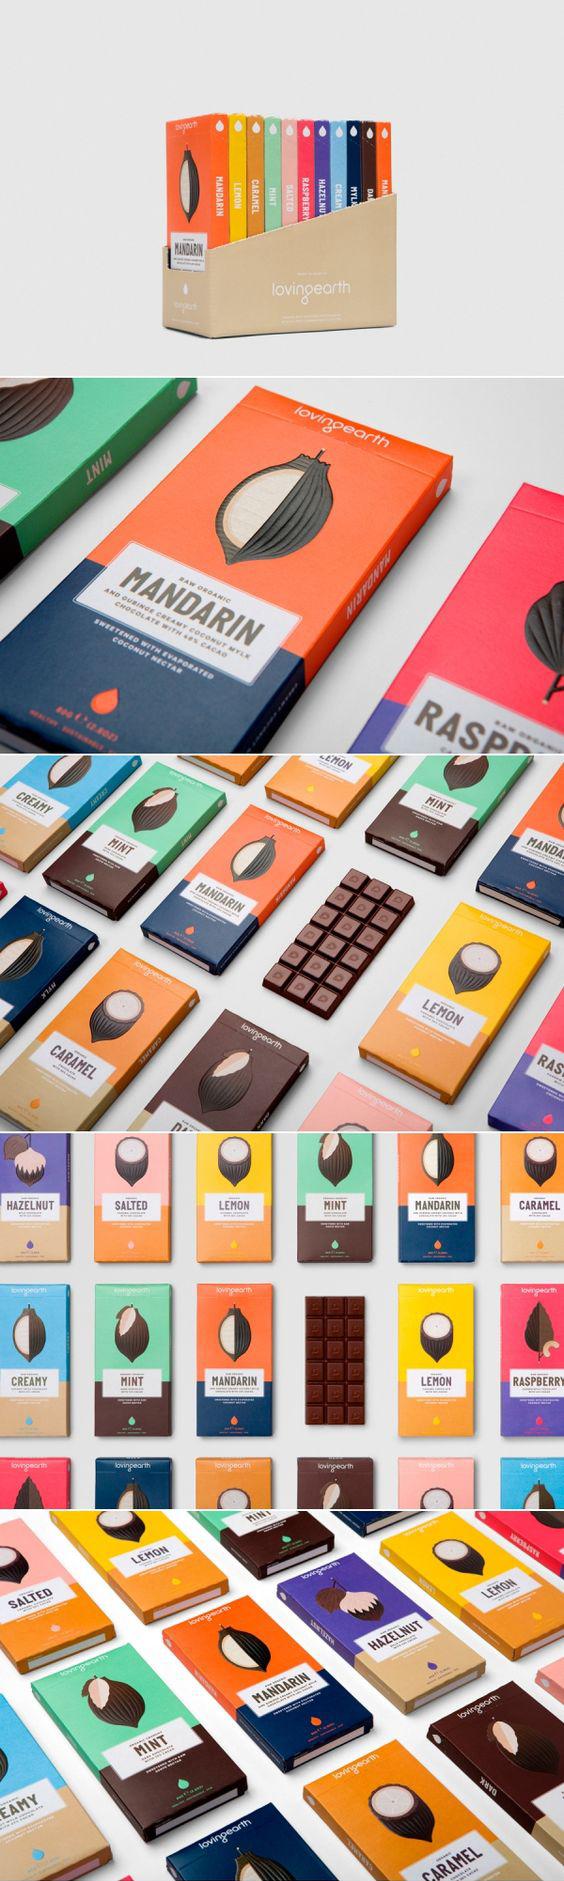 design_packaging08